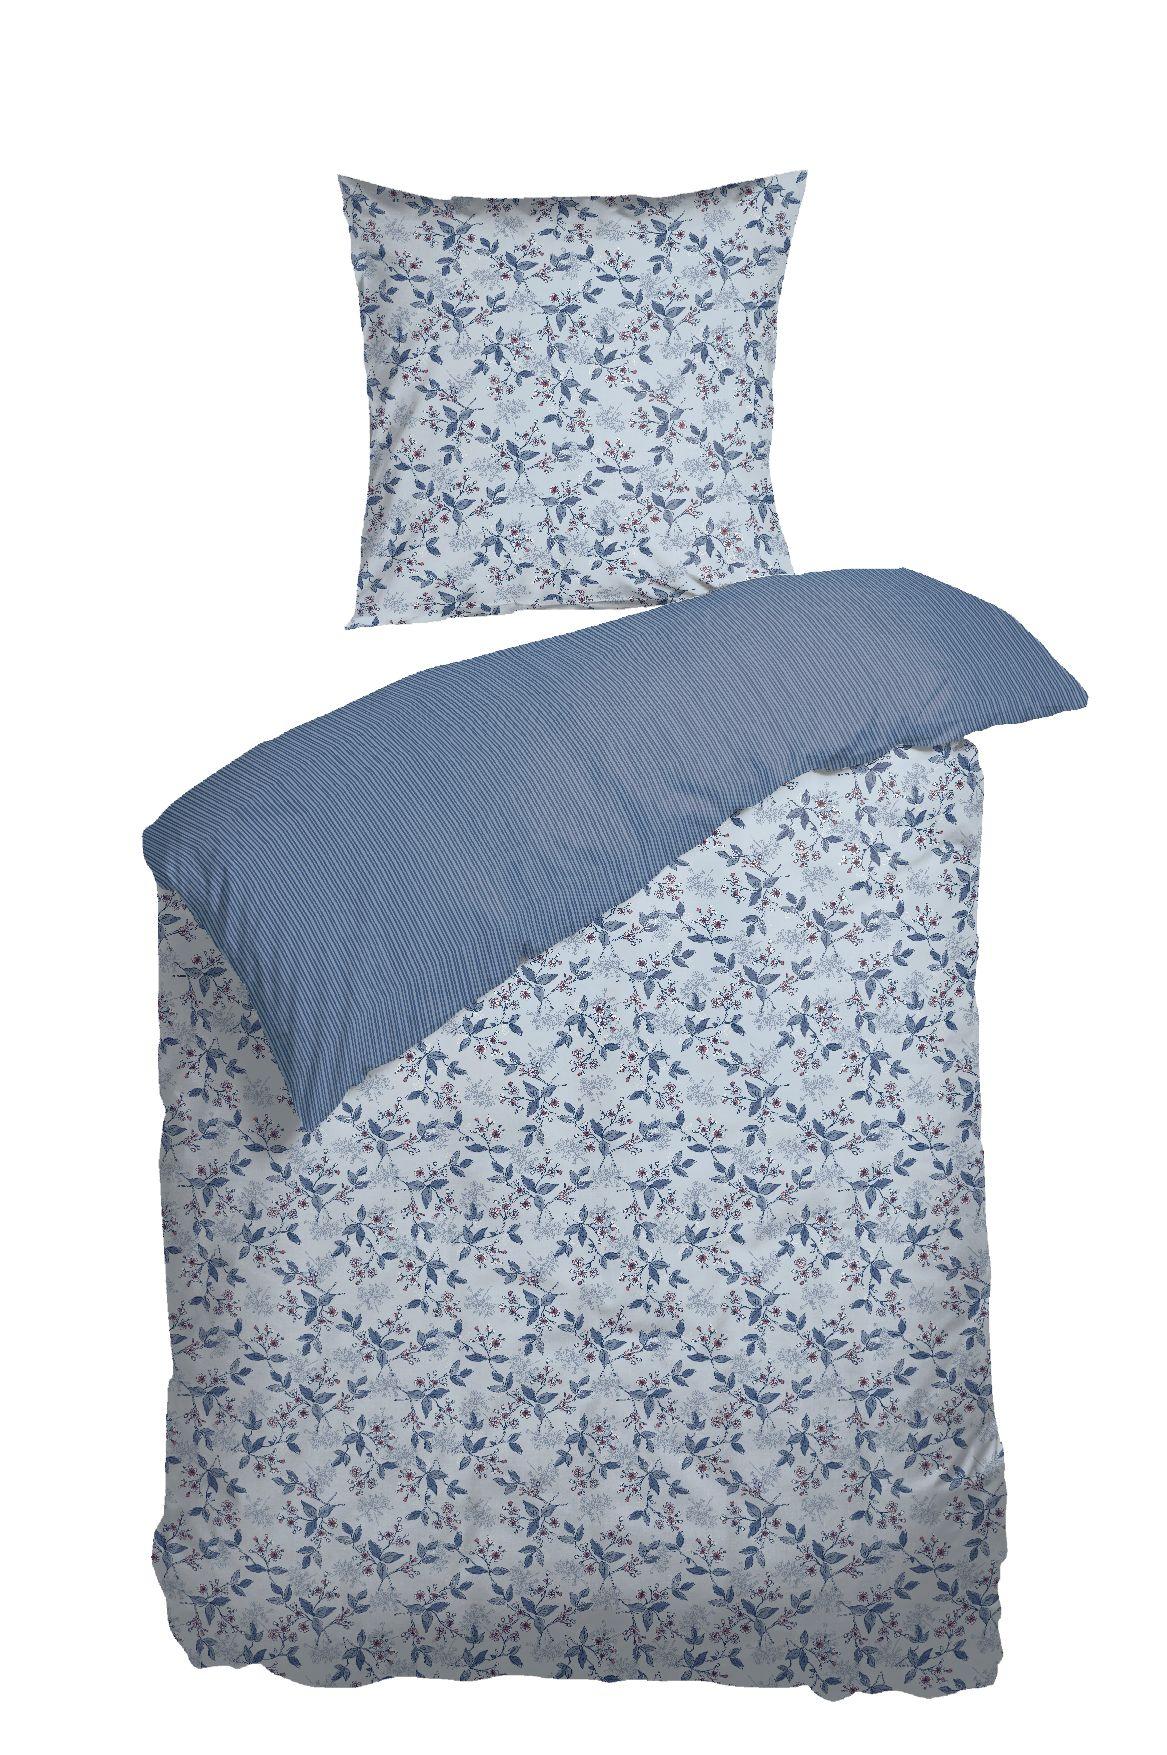 Nordisk Tekstil Ofelia sengelinned